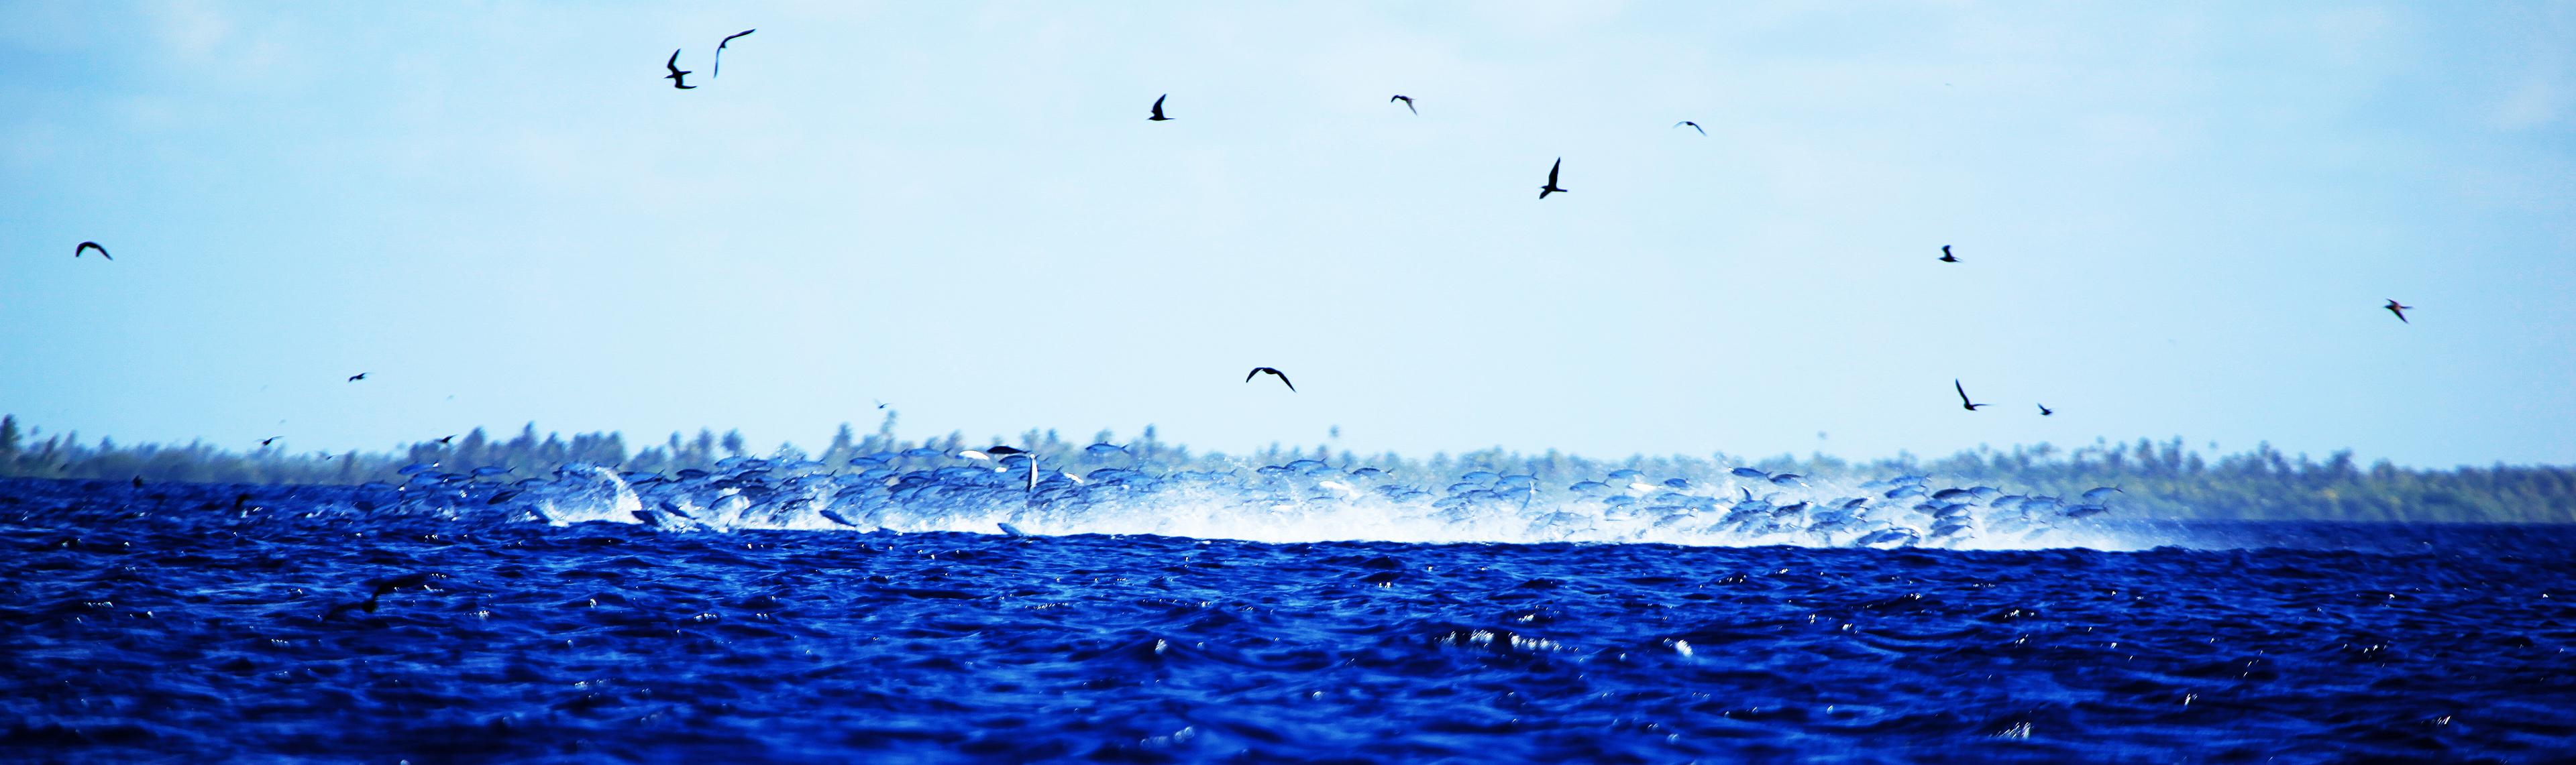 Tuamotu Islands